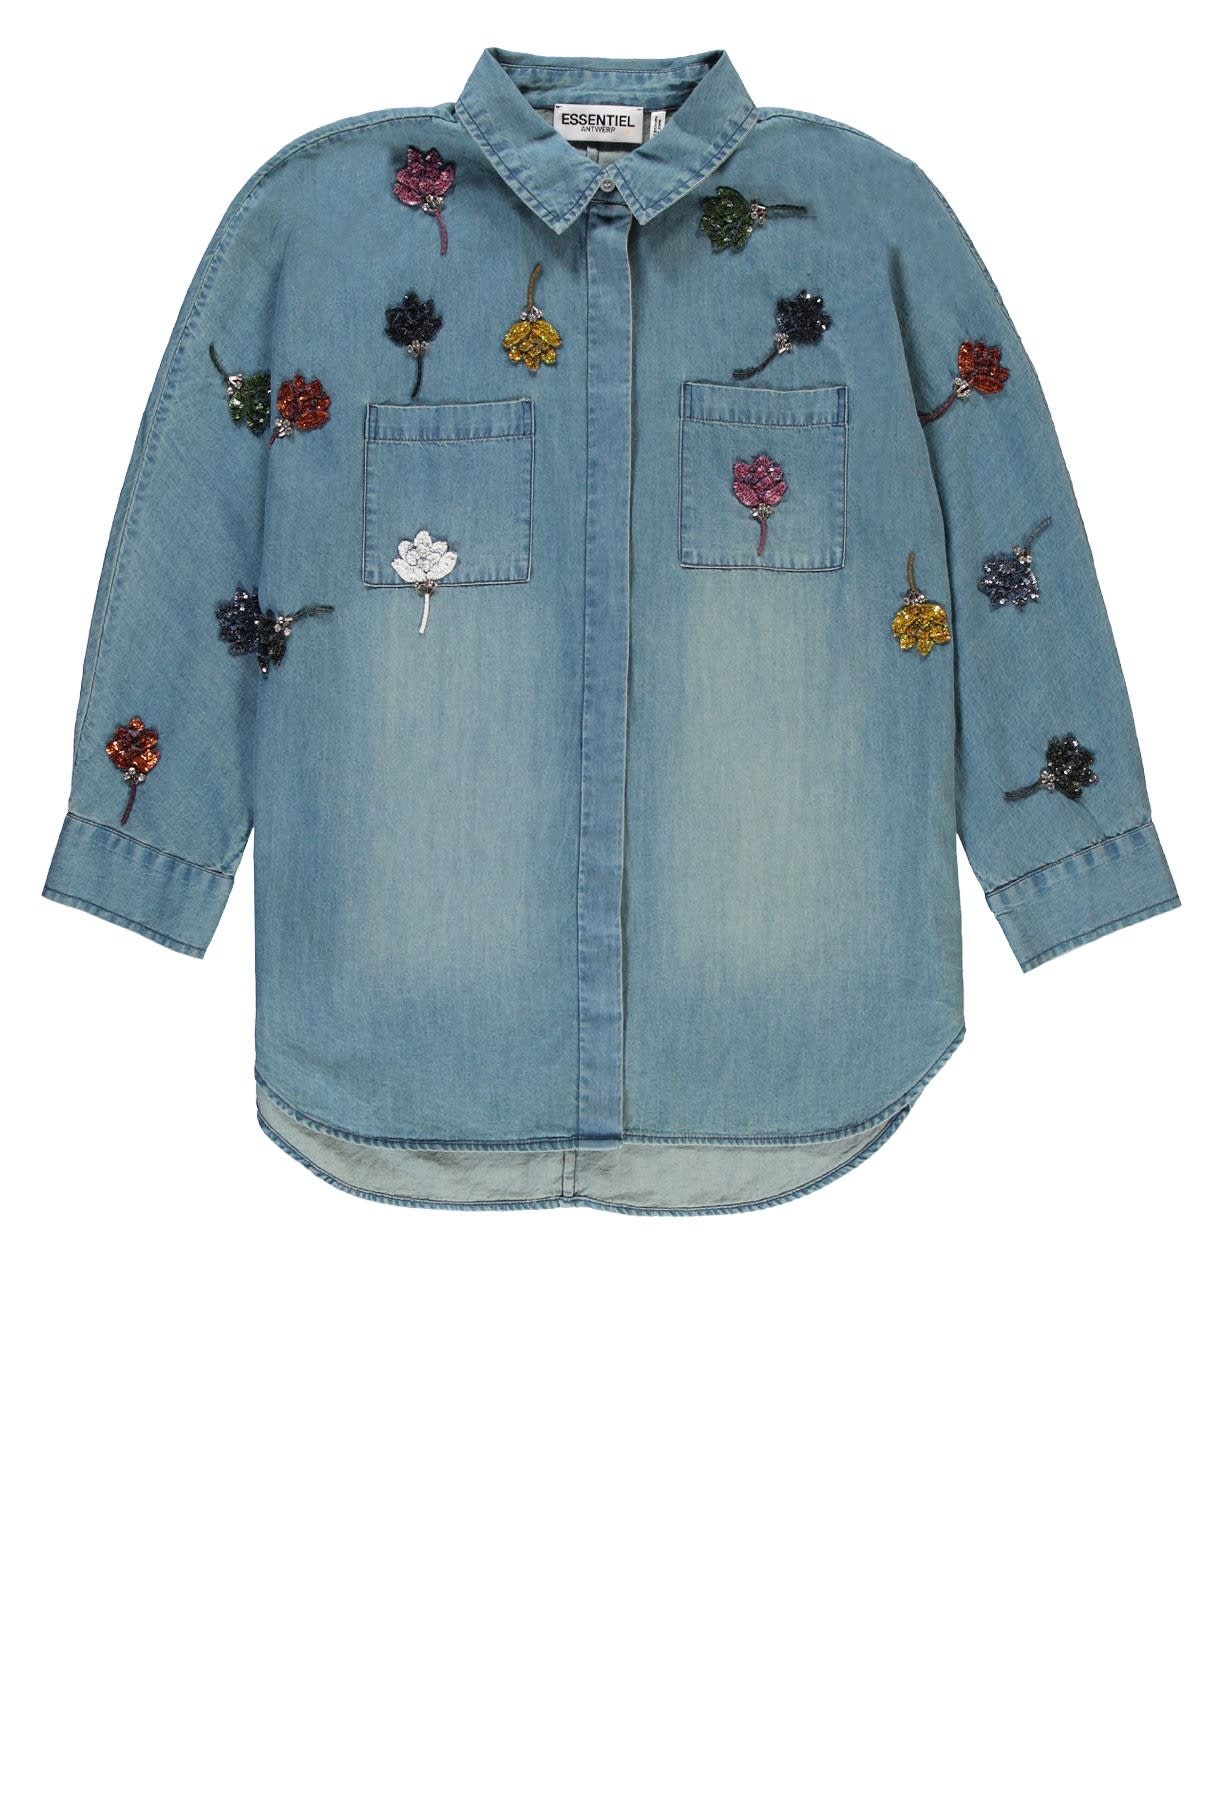 Essentiel Antwerp Rembo Sequined Jeans Shirt